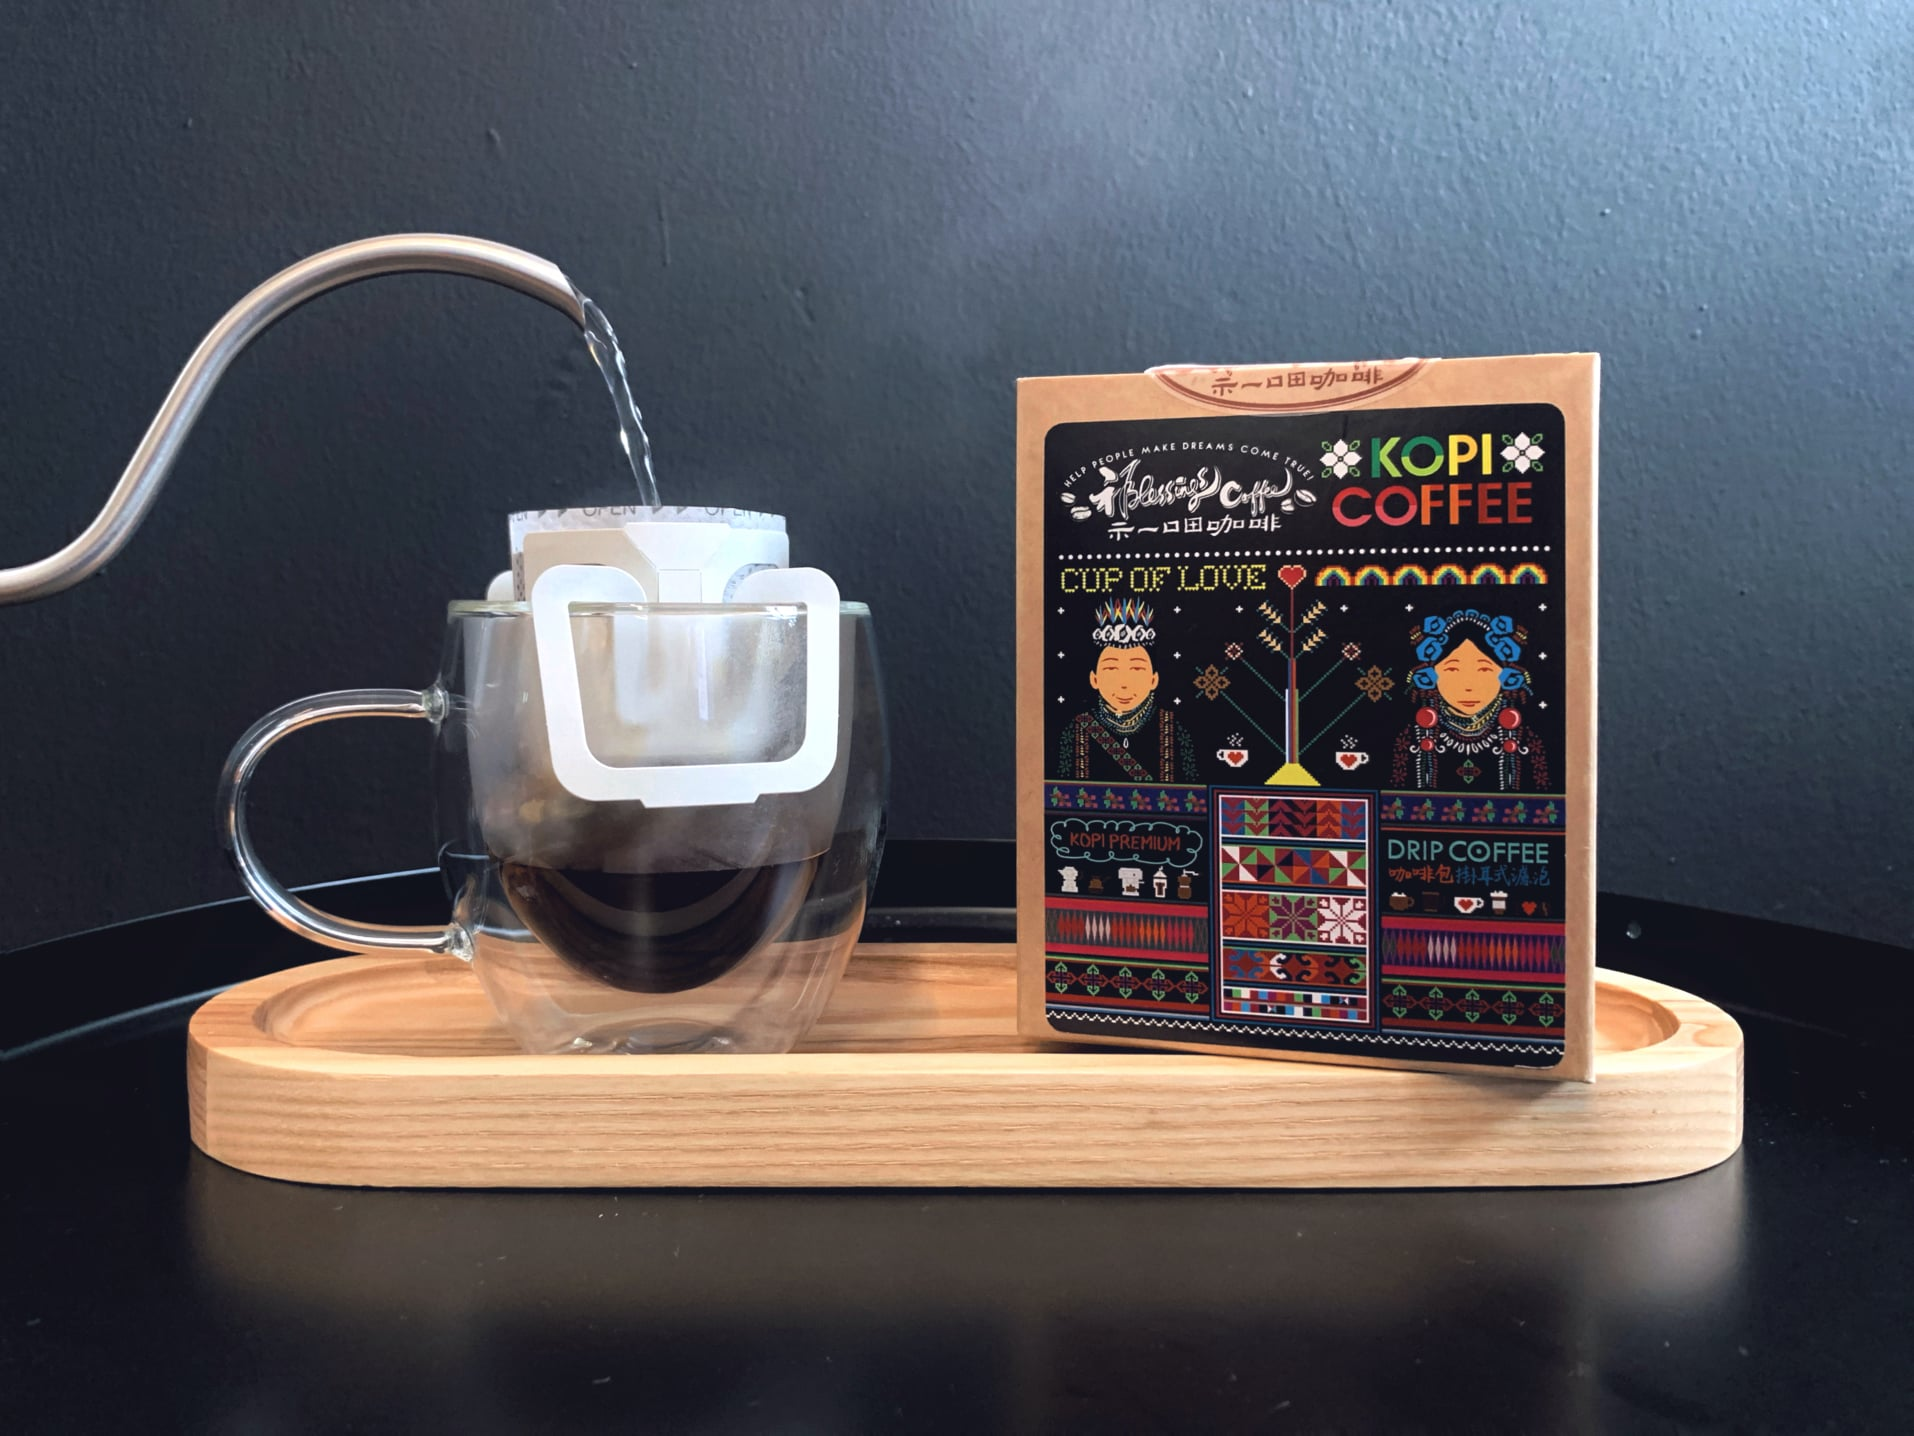 Drip coffee to your doorstep.